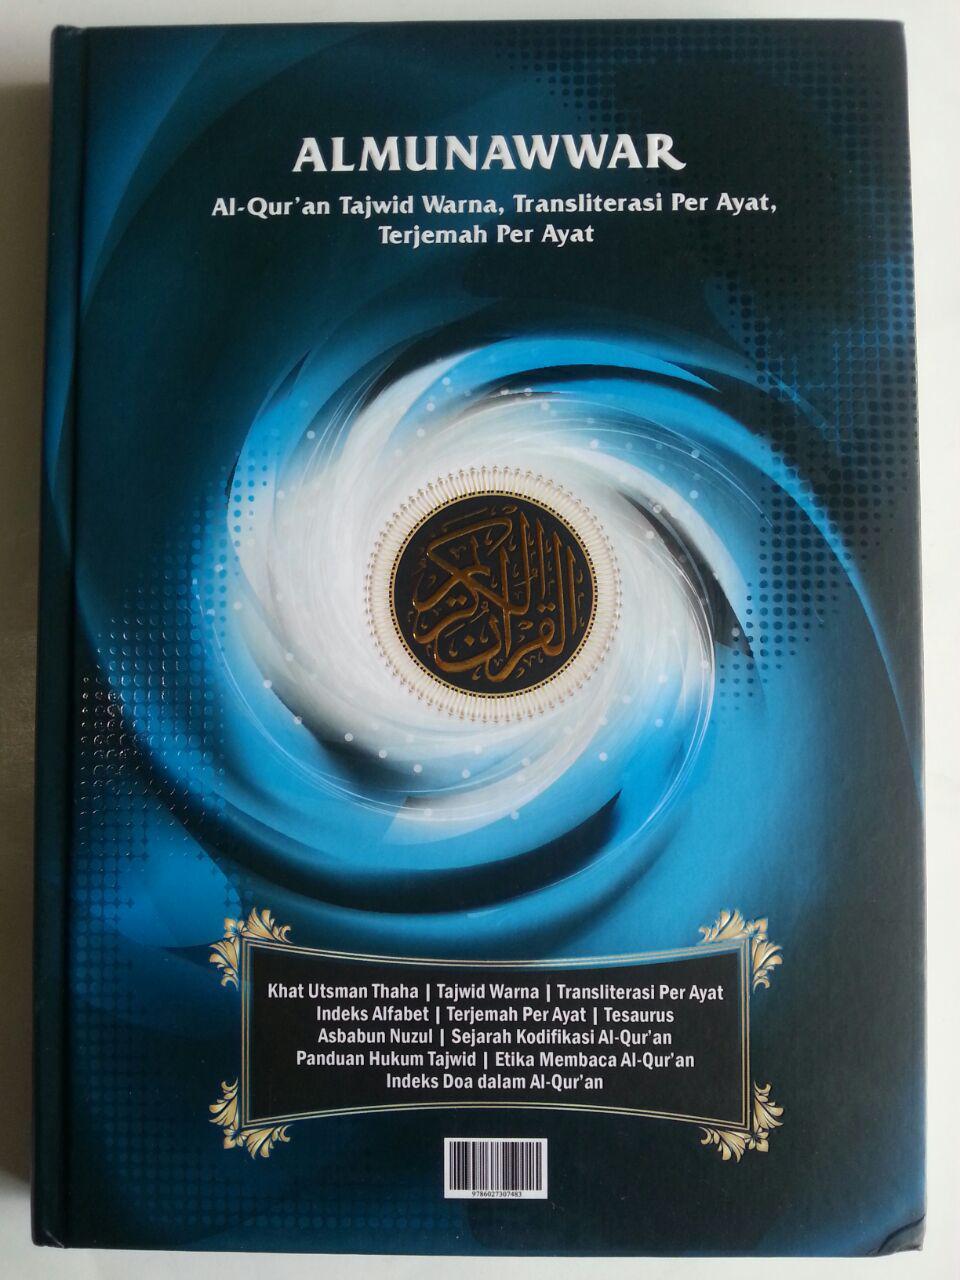 Al-Qur'an Almunawwar Tajwid Warna Transliterasi Terjemah Perayat A5 cover